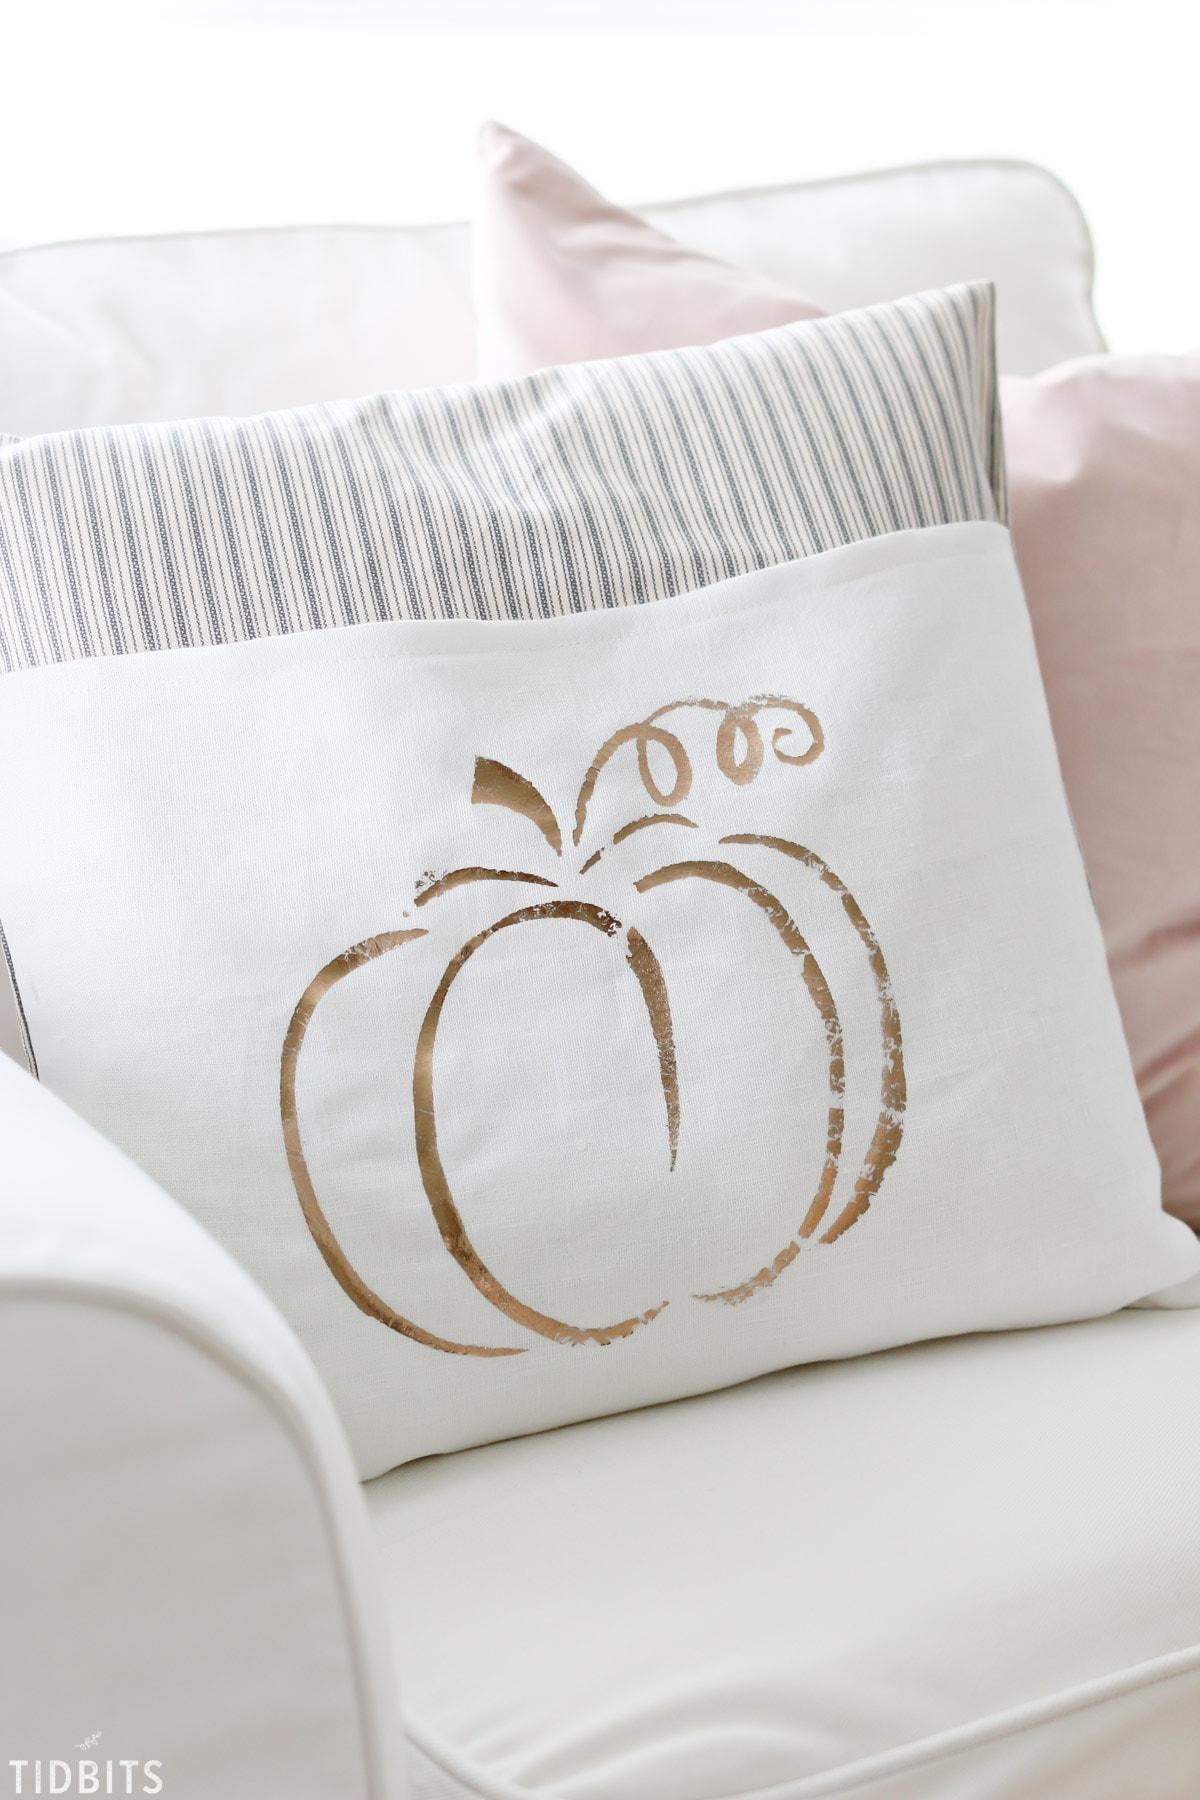 DIY pillows with metallic paint words